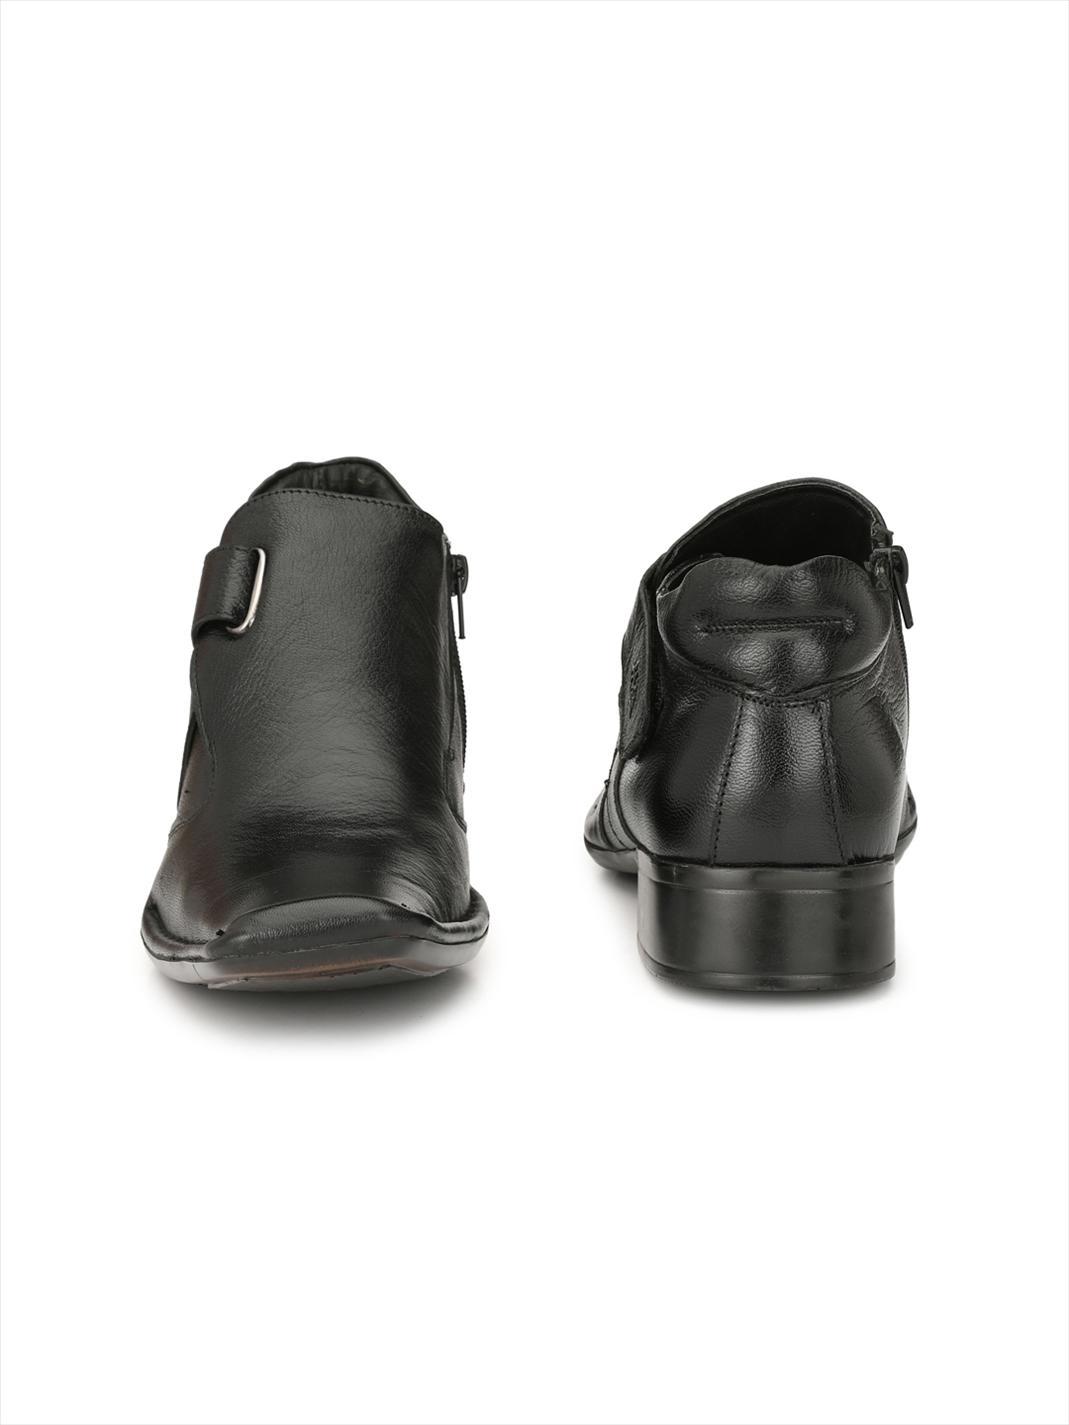 Hitz | Hitz Black Leather Boots For Men with Zip-Closure